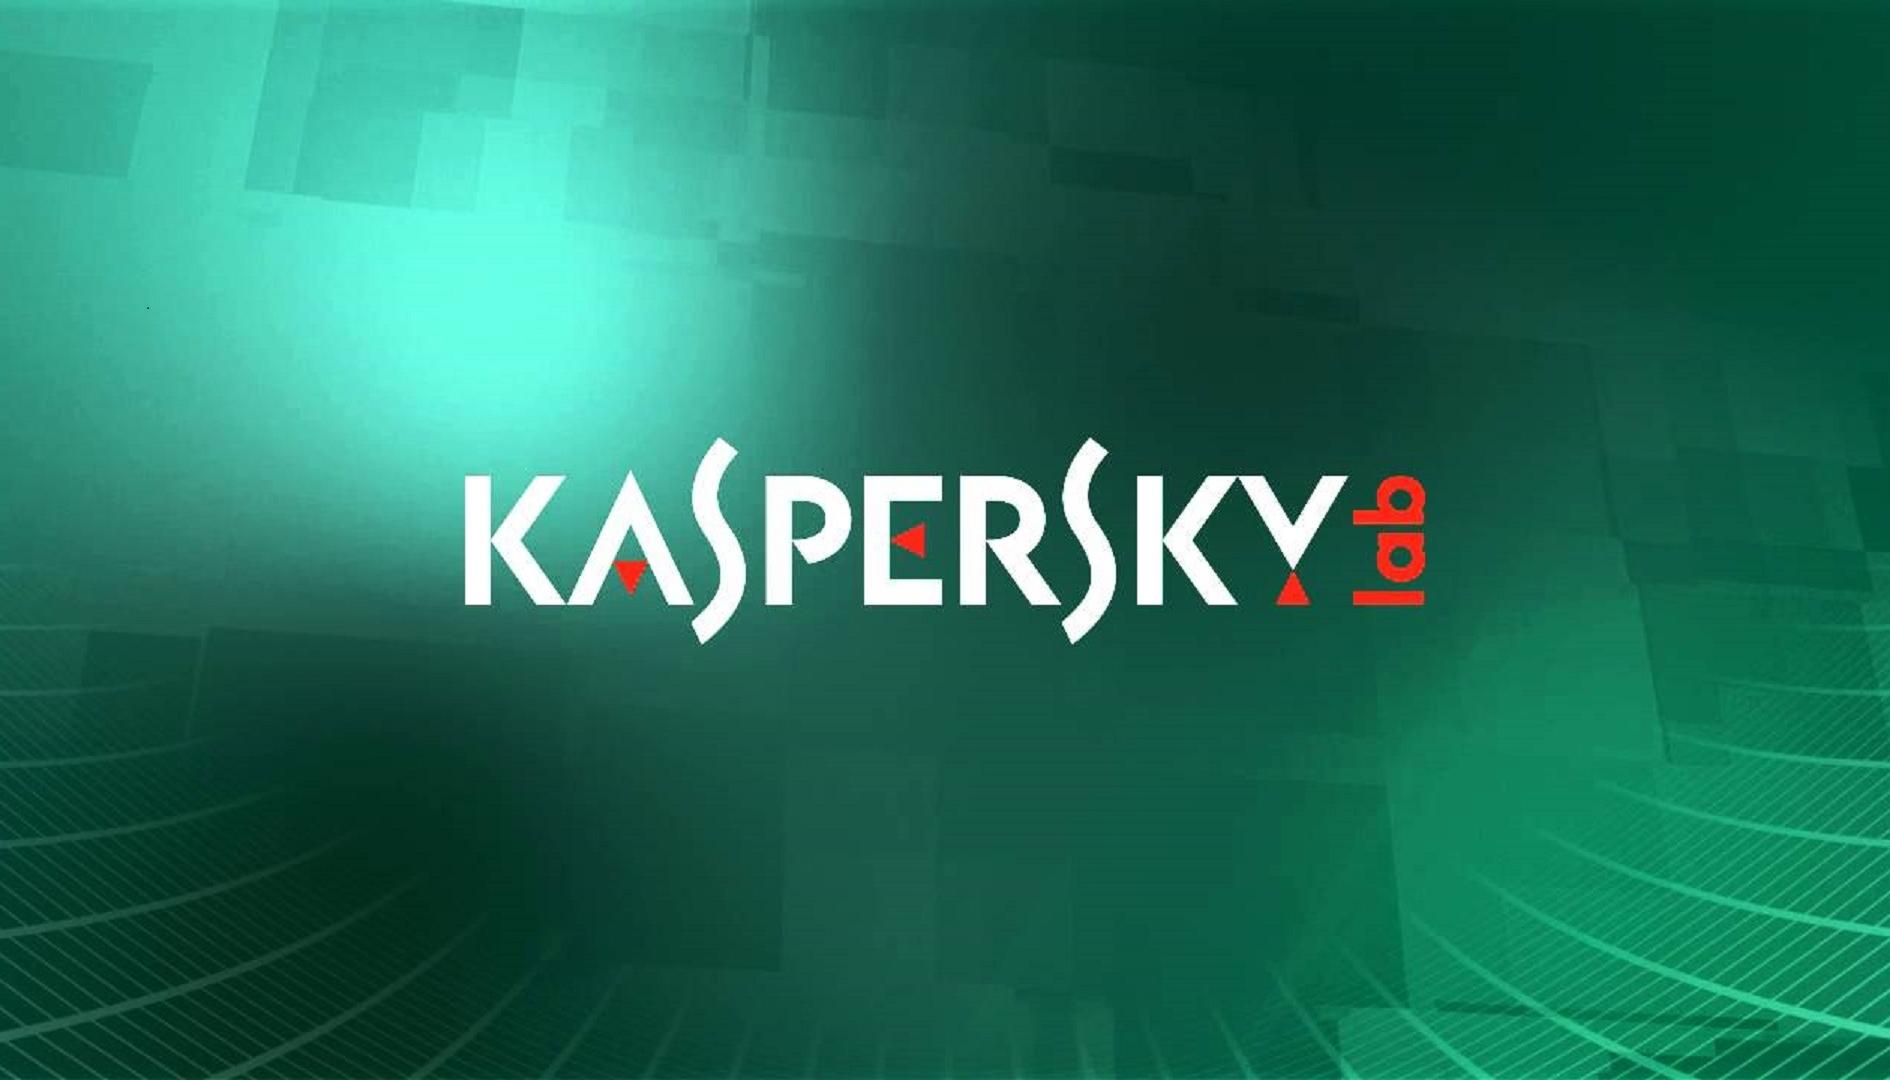 Kaspersky, il 41% degli utenti usa ancora sistemi operativi obsoleti